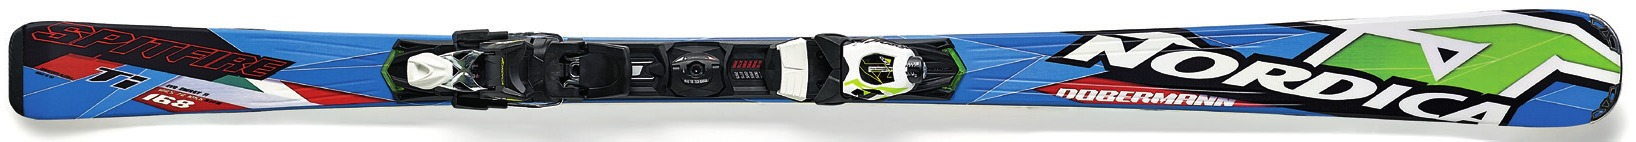 Nordica Dobermann Spitfire TI-N Pro